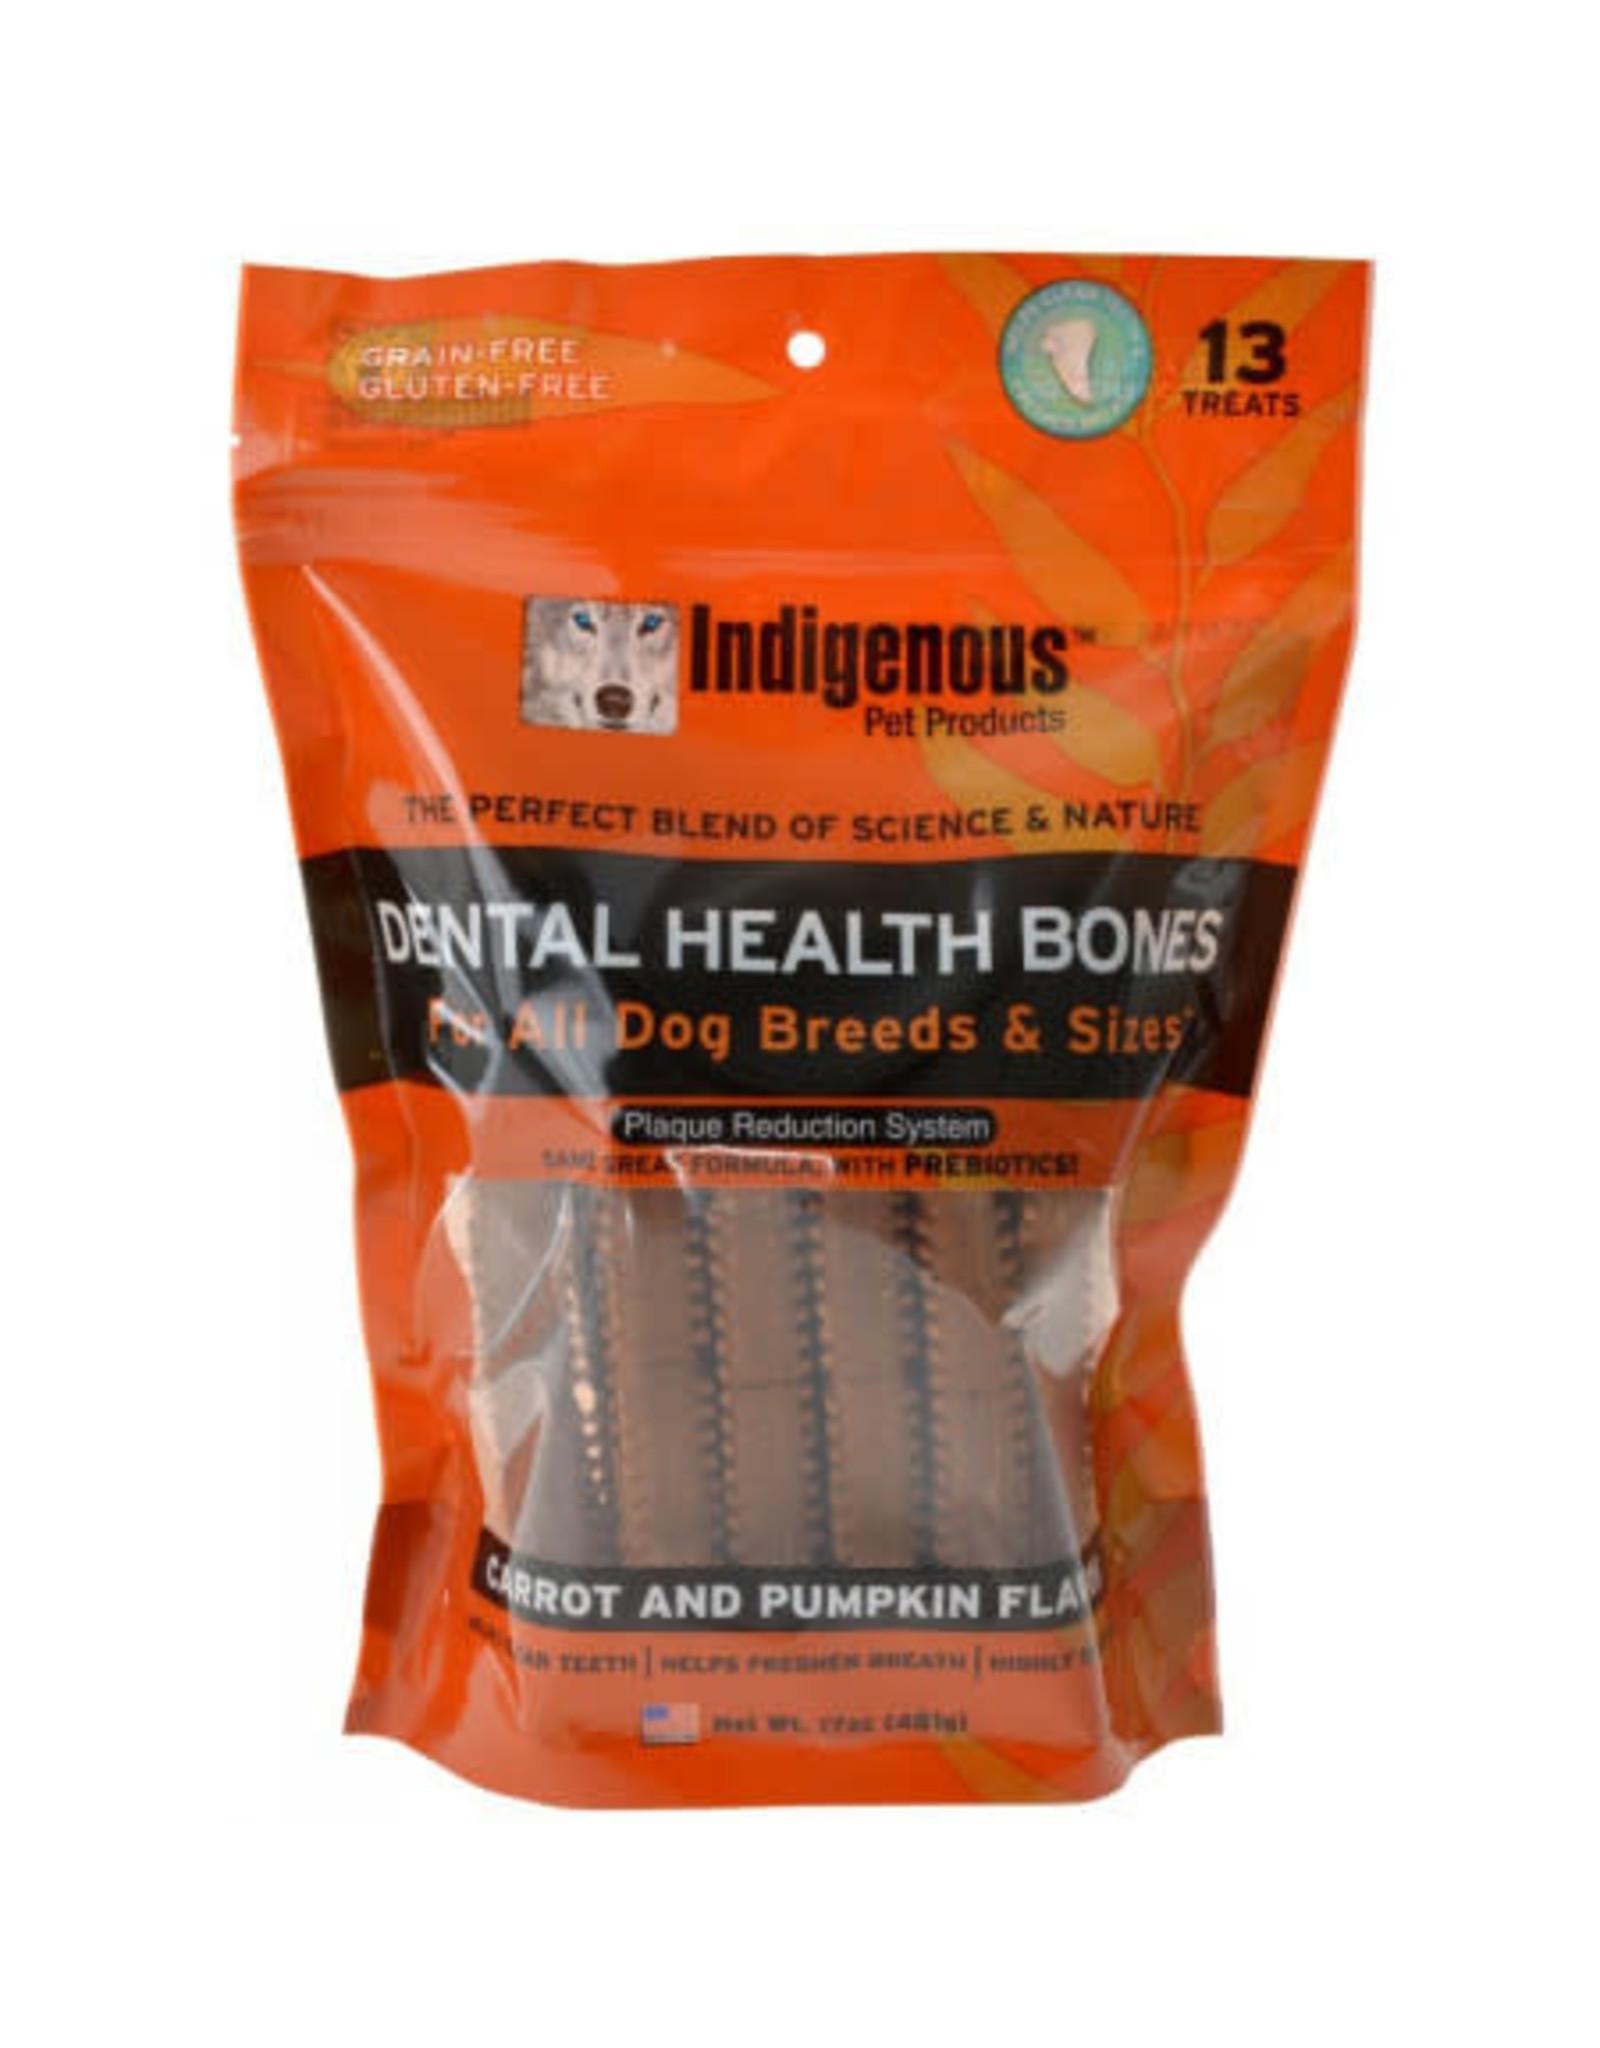 Indigenous Pet Products INDIGENOUS DENTAL HEALTH BONES CARROT AND PUMPKIN FLAVOR 13-COUNT